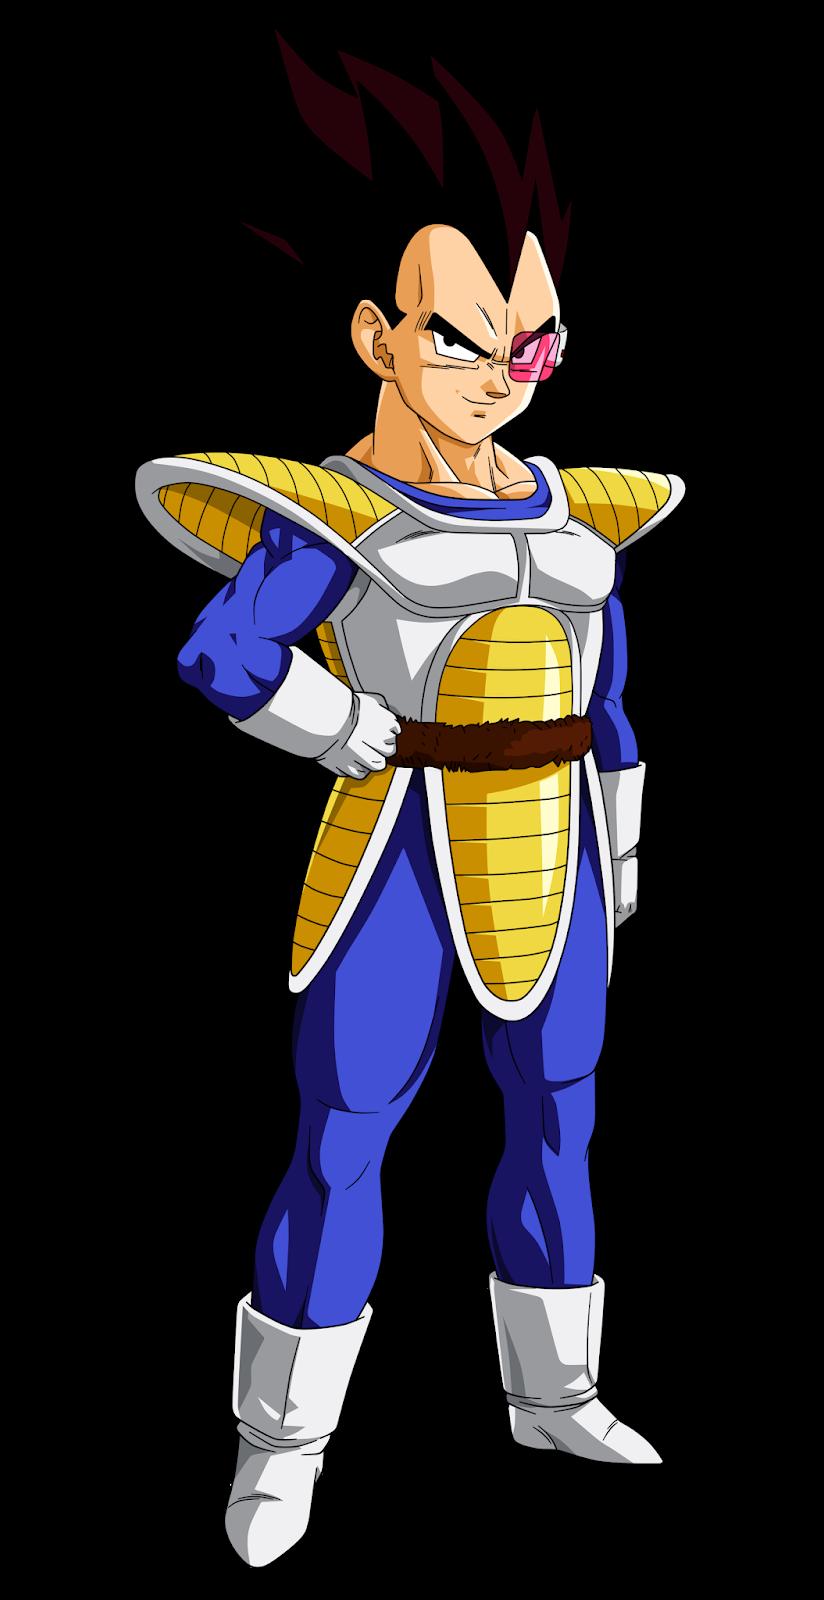 Dragon Ball Z English Dubbed Episodes - Dragon Ball Z